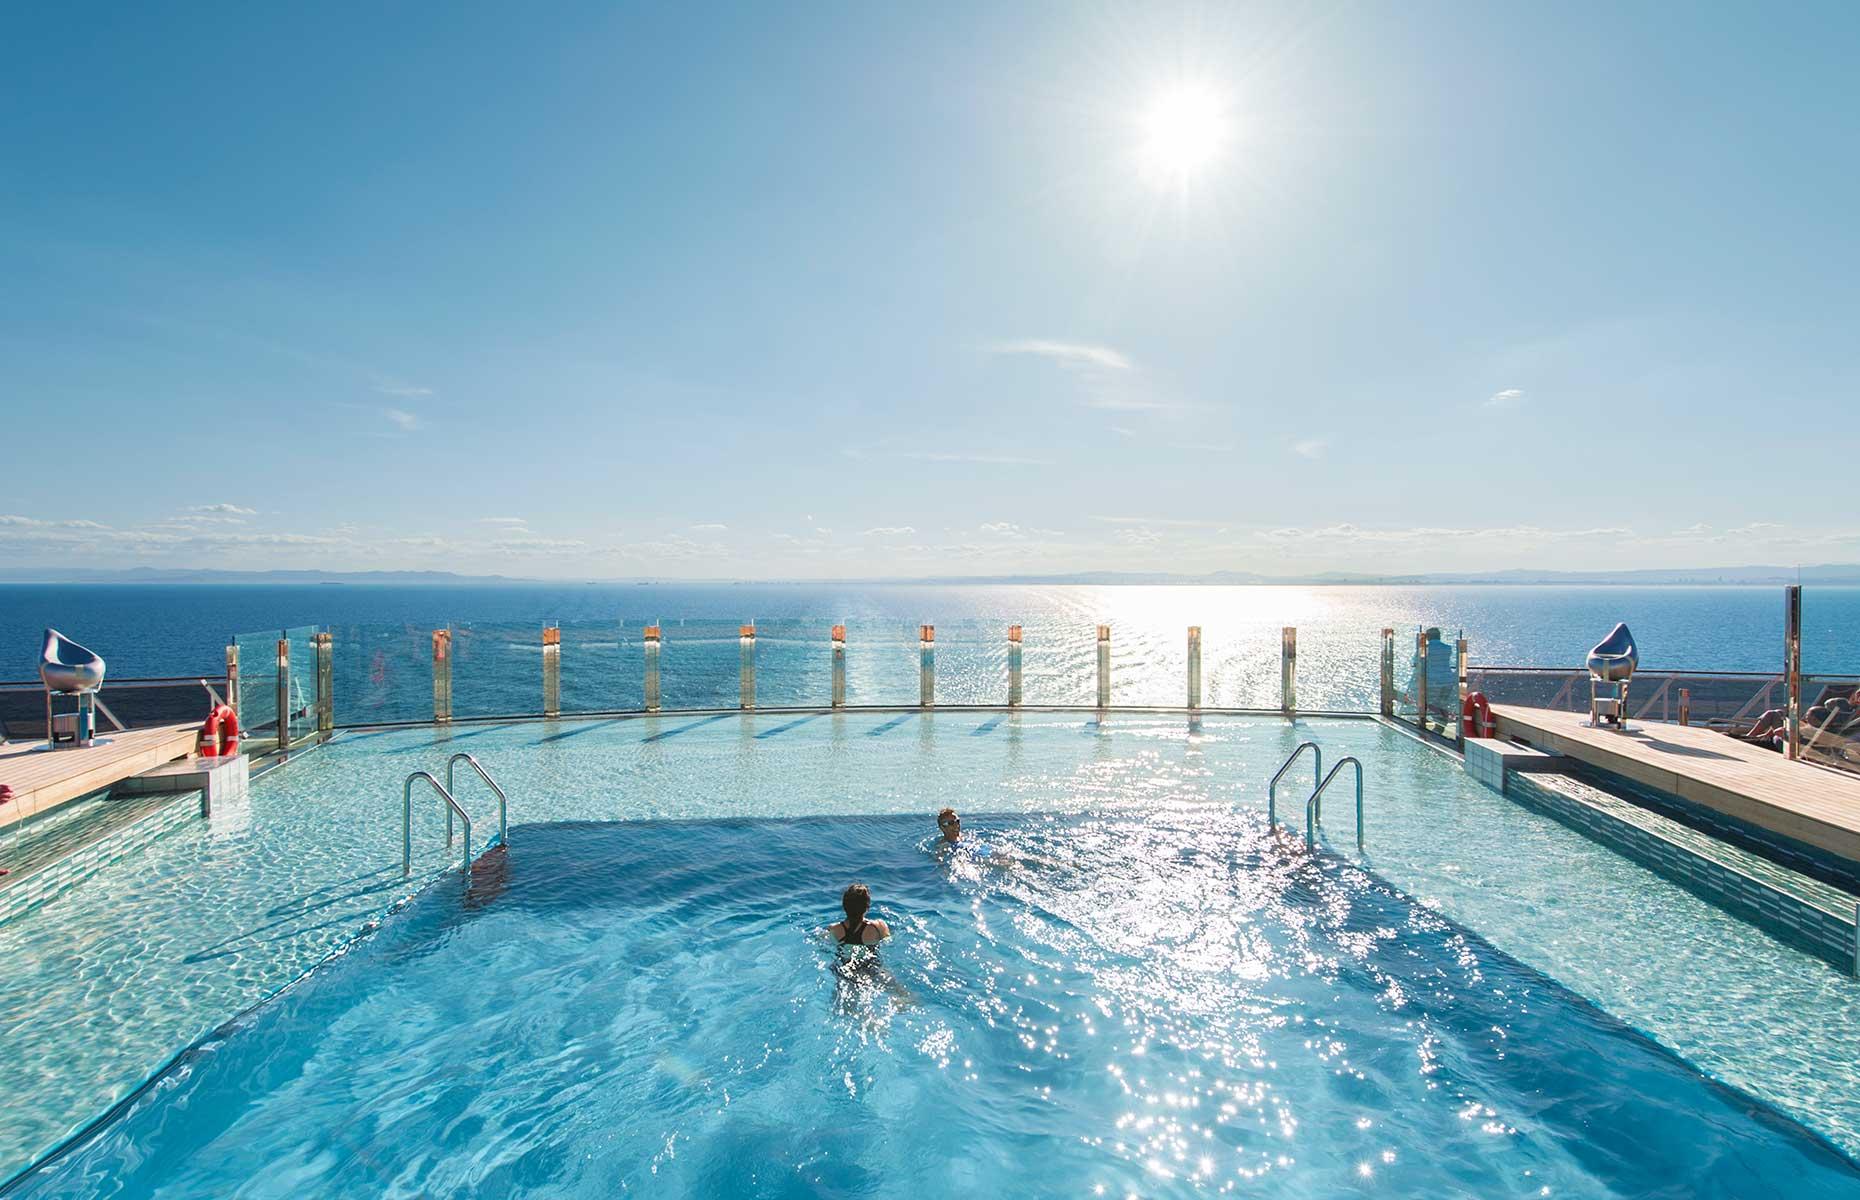 Pool on MSC Preziosa (Image: Courtesy of MSC)